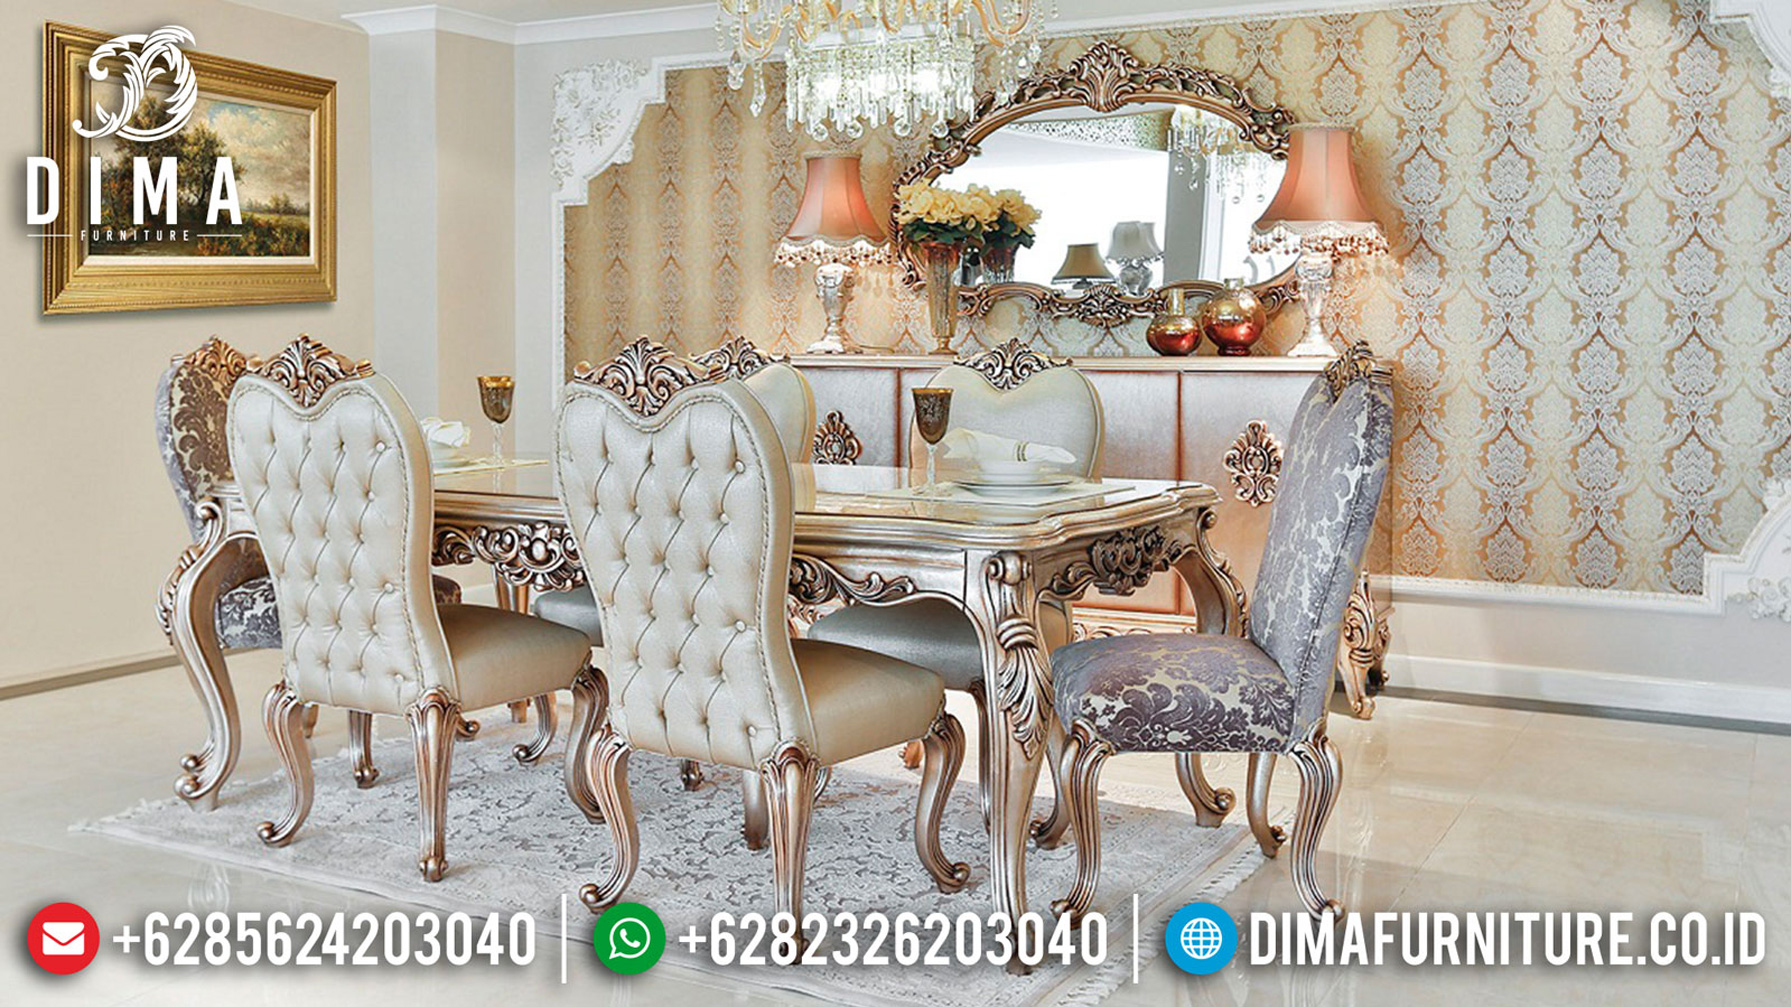 Buy Now Meja Makan Terbaru Desain Mewah Luxury Carving Jepara ST-1156